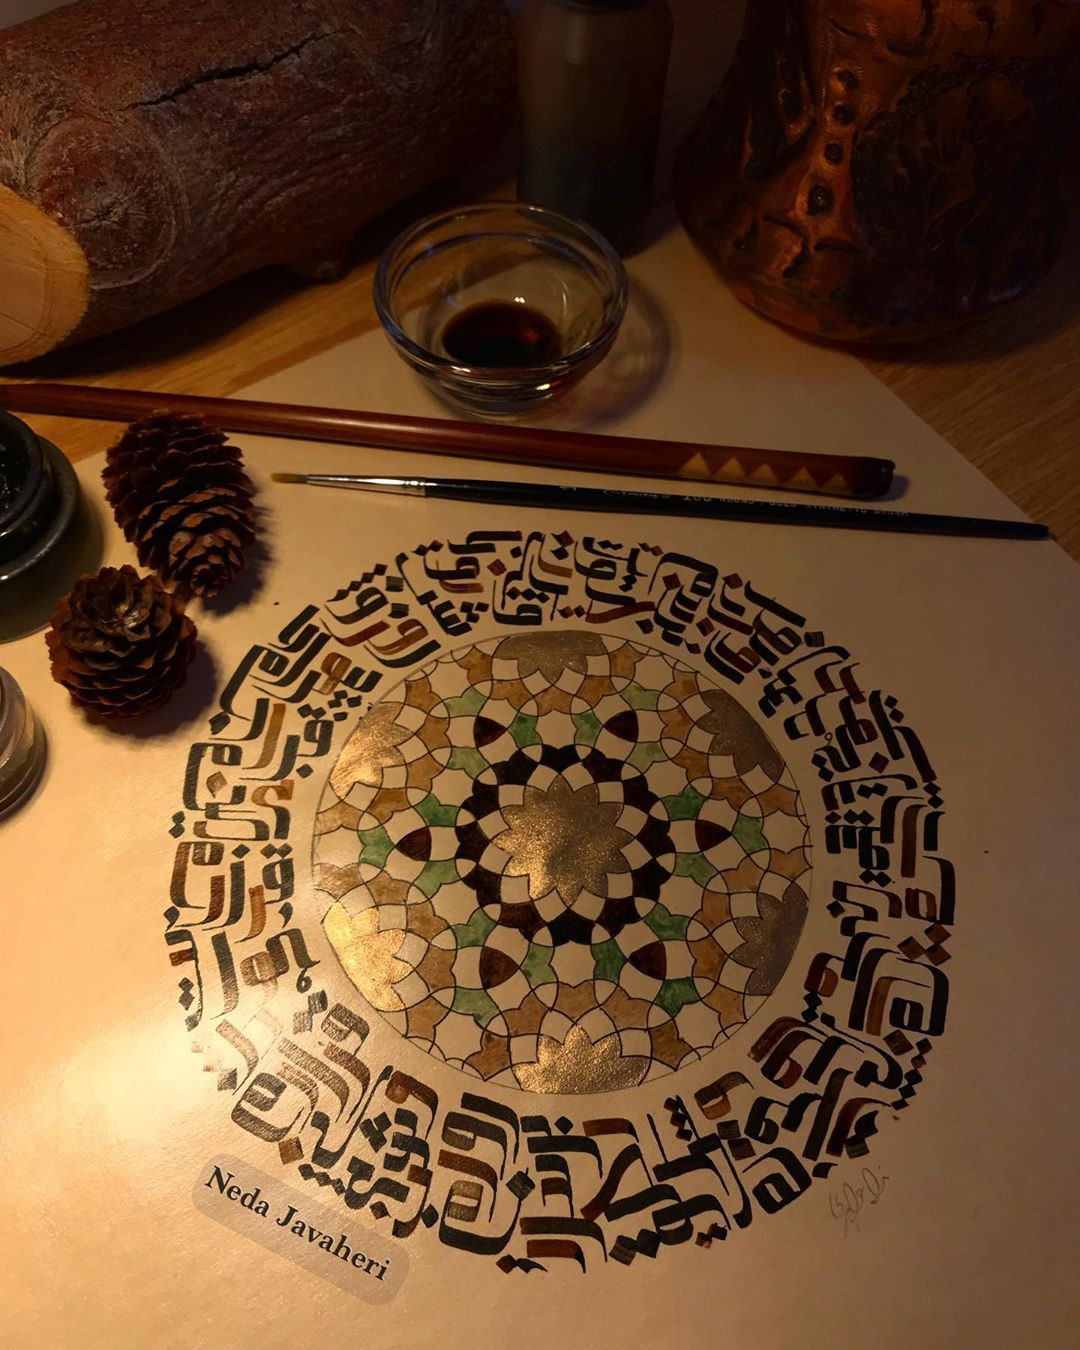 Karya Kaligrafi  در هوایت بی قرارم… بیقرارم روز و شب…. مولانا (متن نوشتار) . . . اجرا،  مرکب…- Ne Javaher